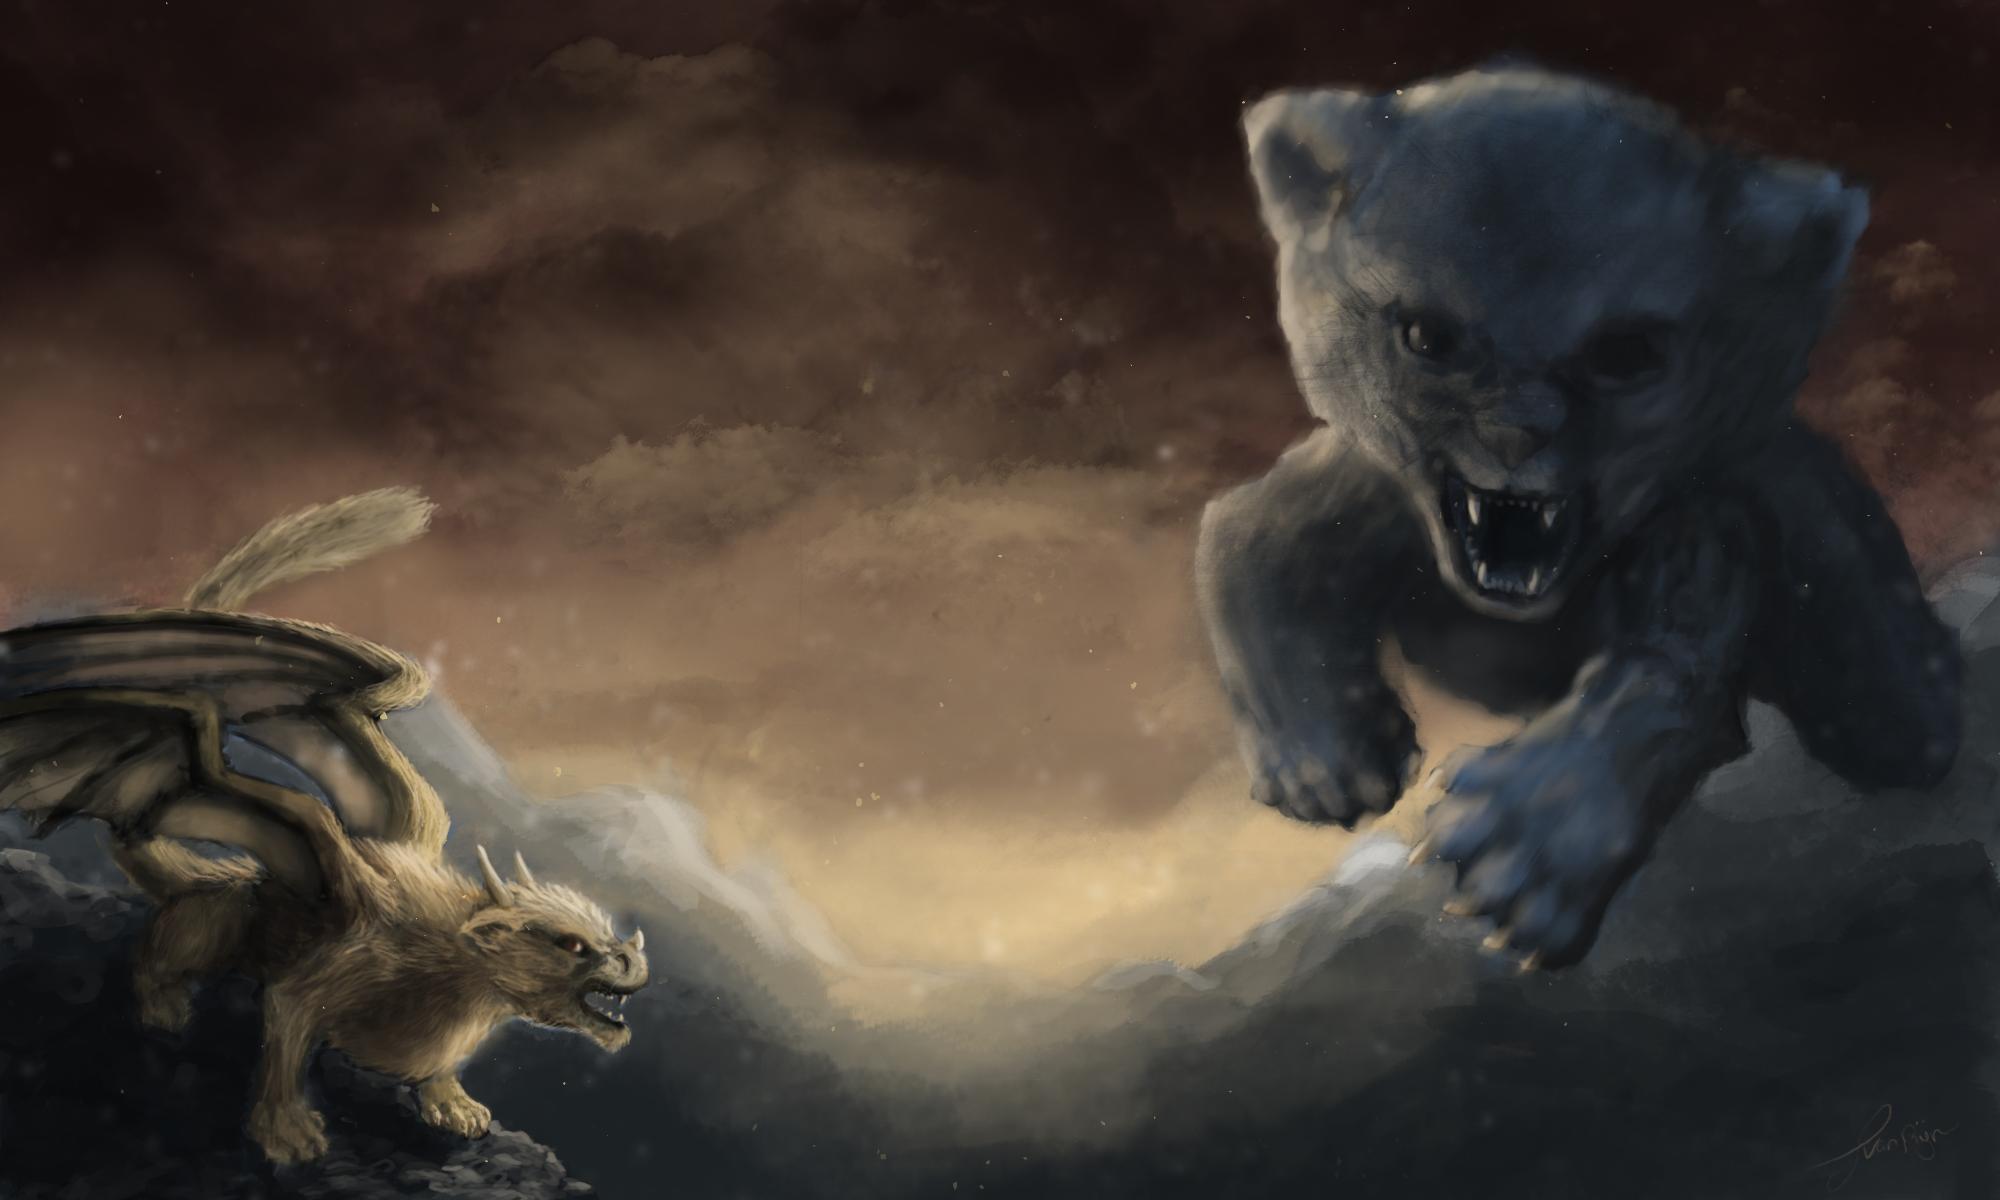 the dragon vs the kitten